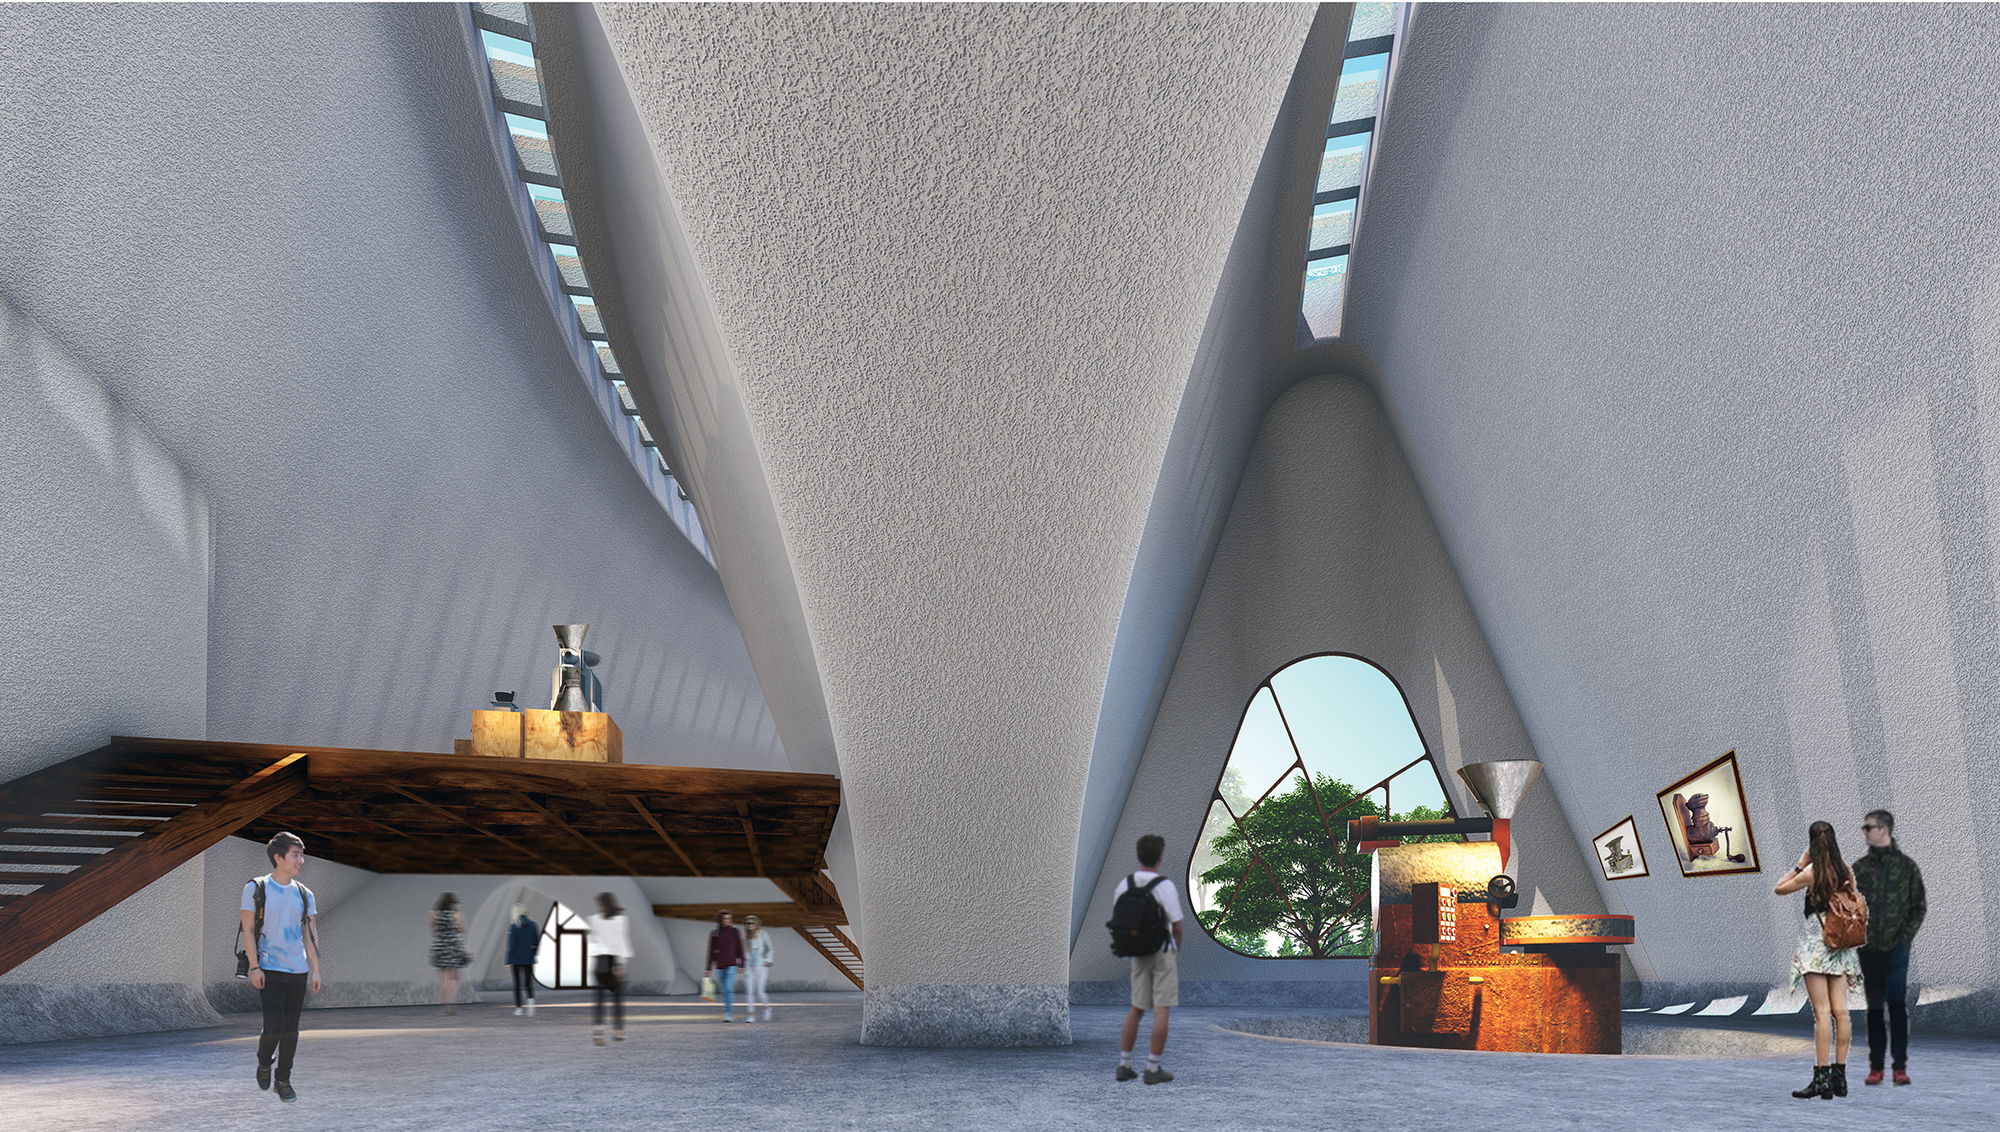 02_interior rendering 2